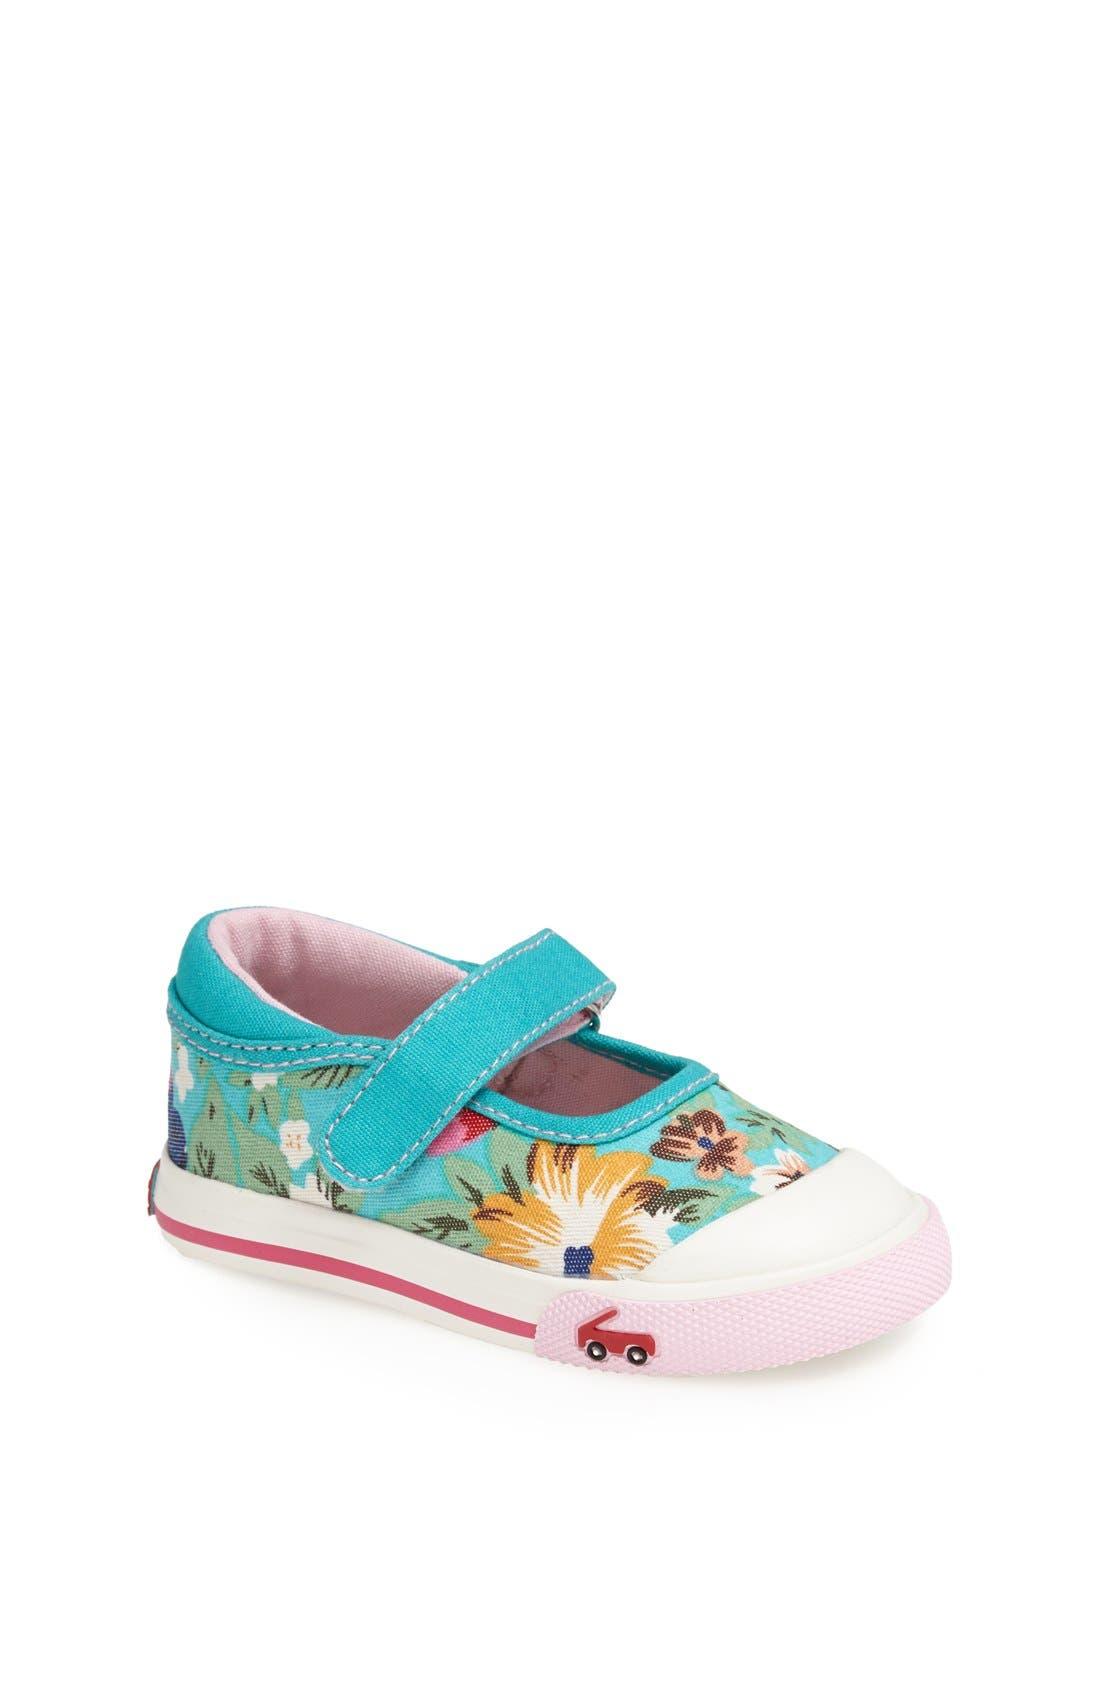 Alternate Image 1 Selected - See Kai Run 'Marie' Mary Jane Sneaker (Baby, Walker & Toddler)